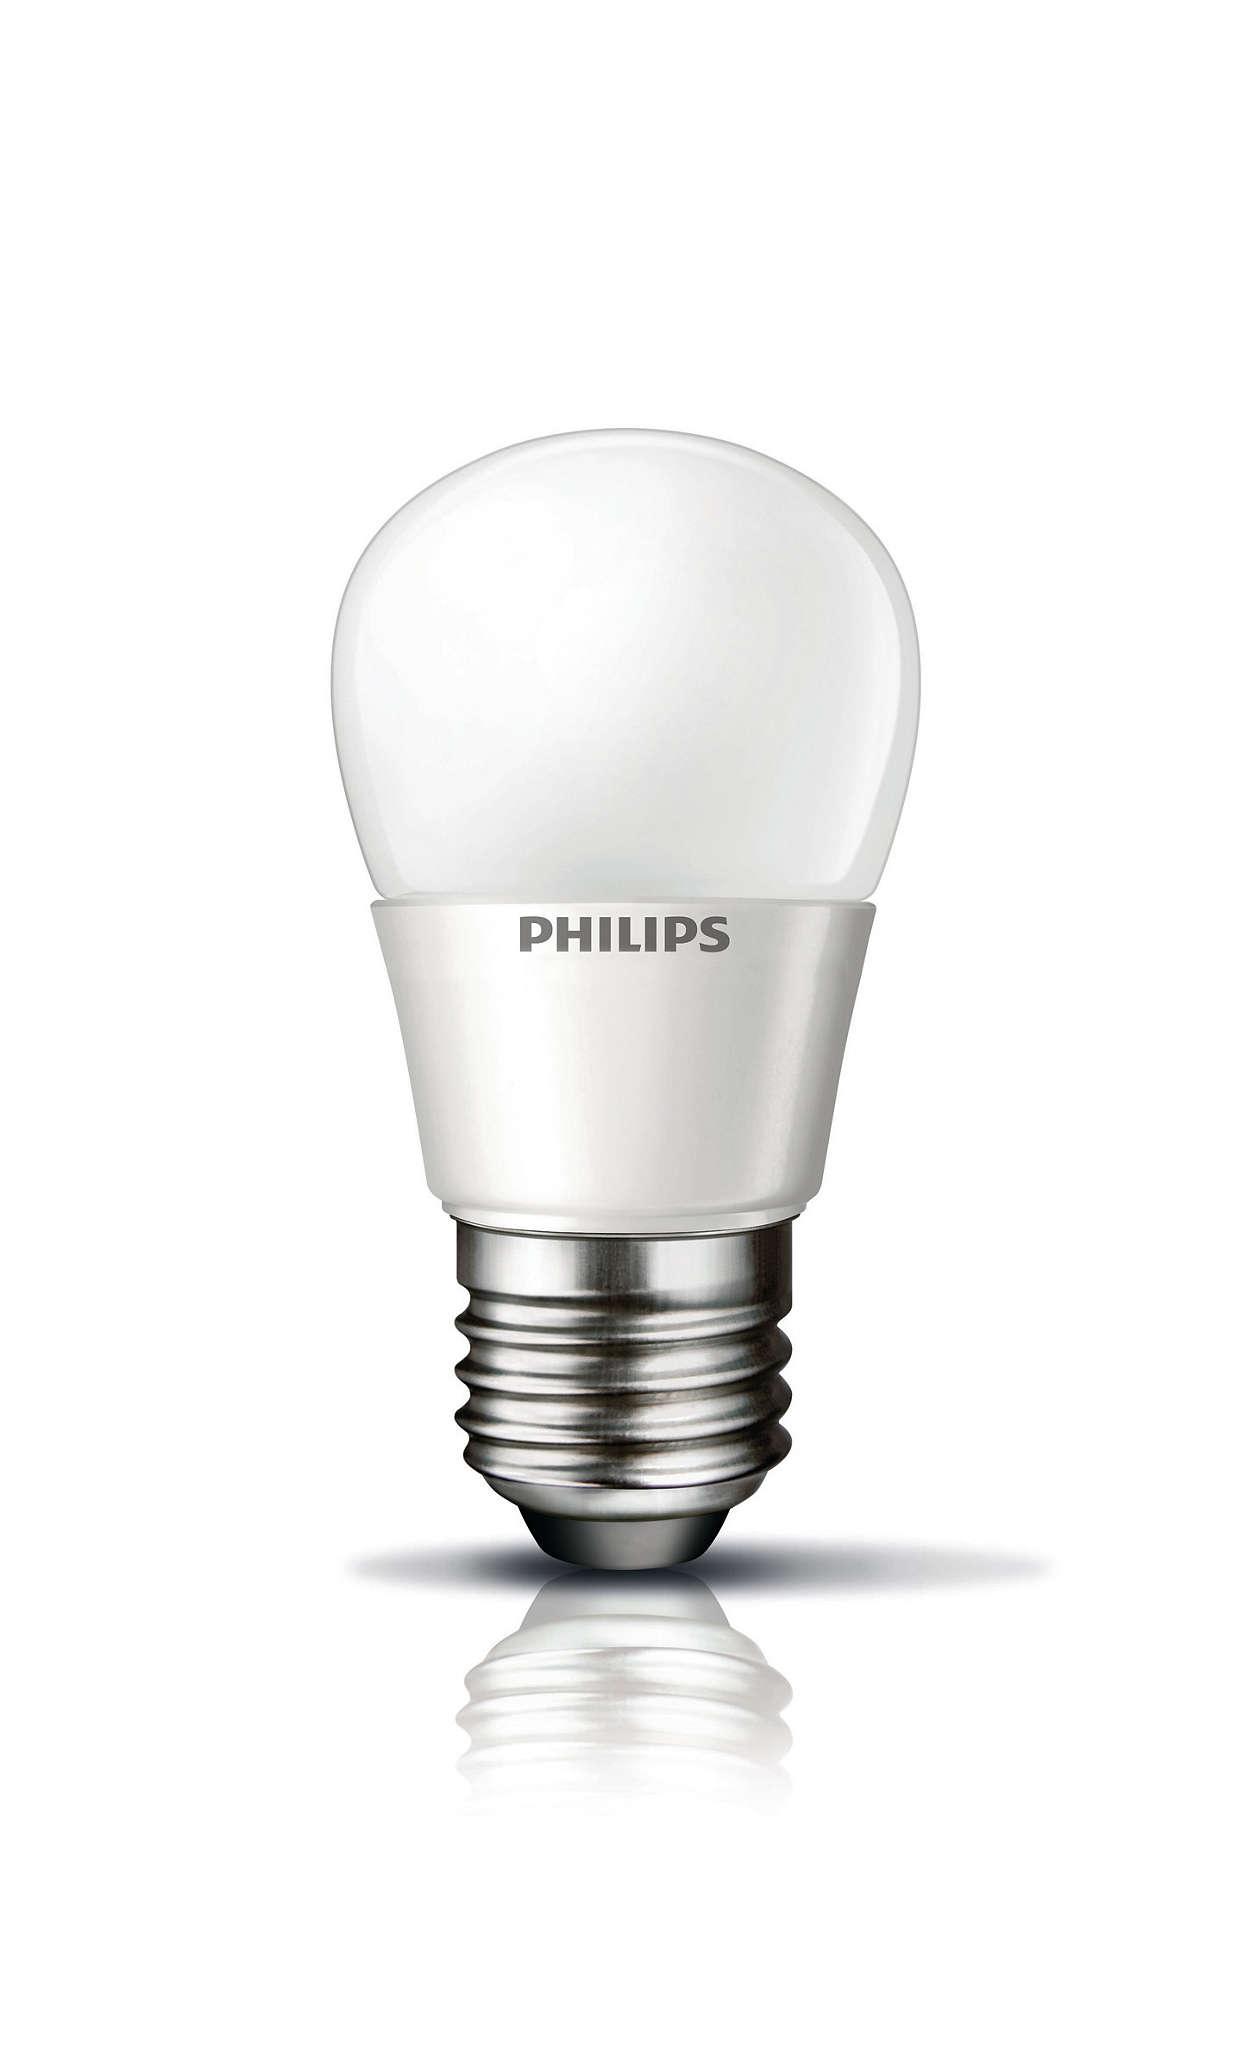 Risparmio energetico senza compromessi